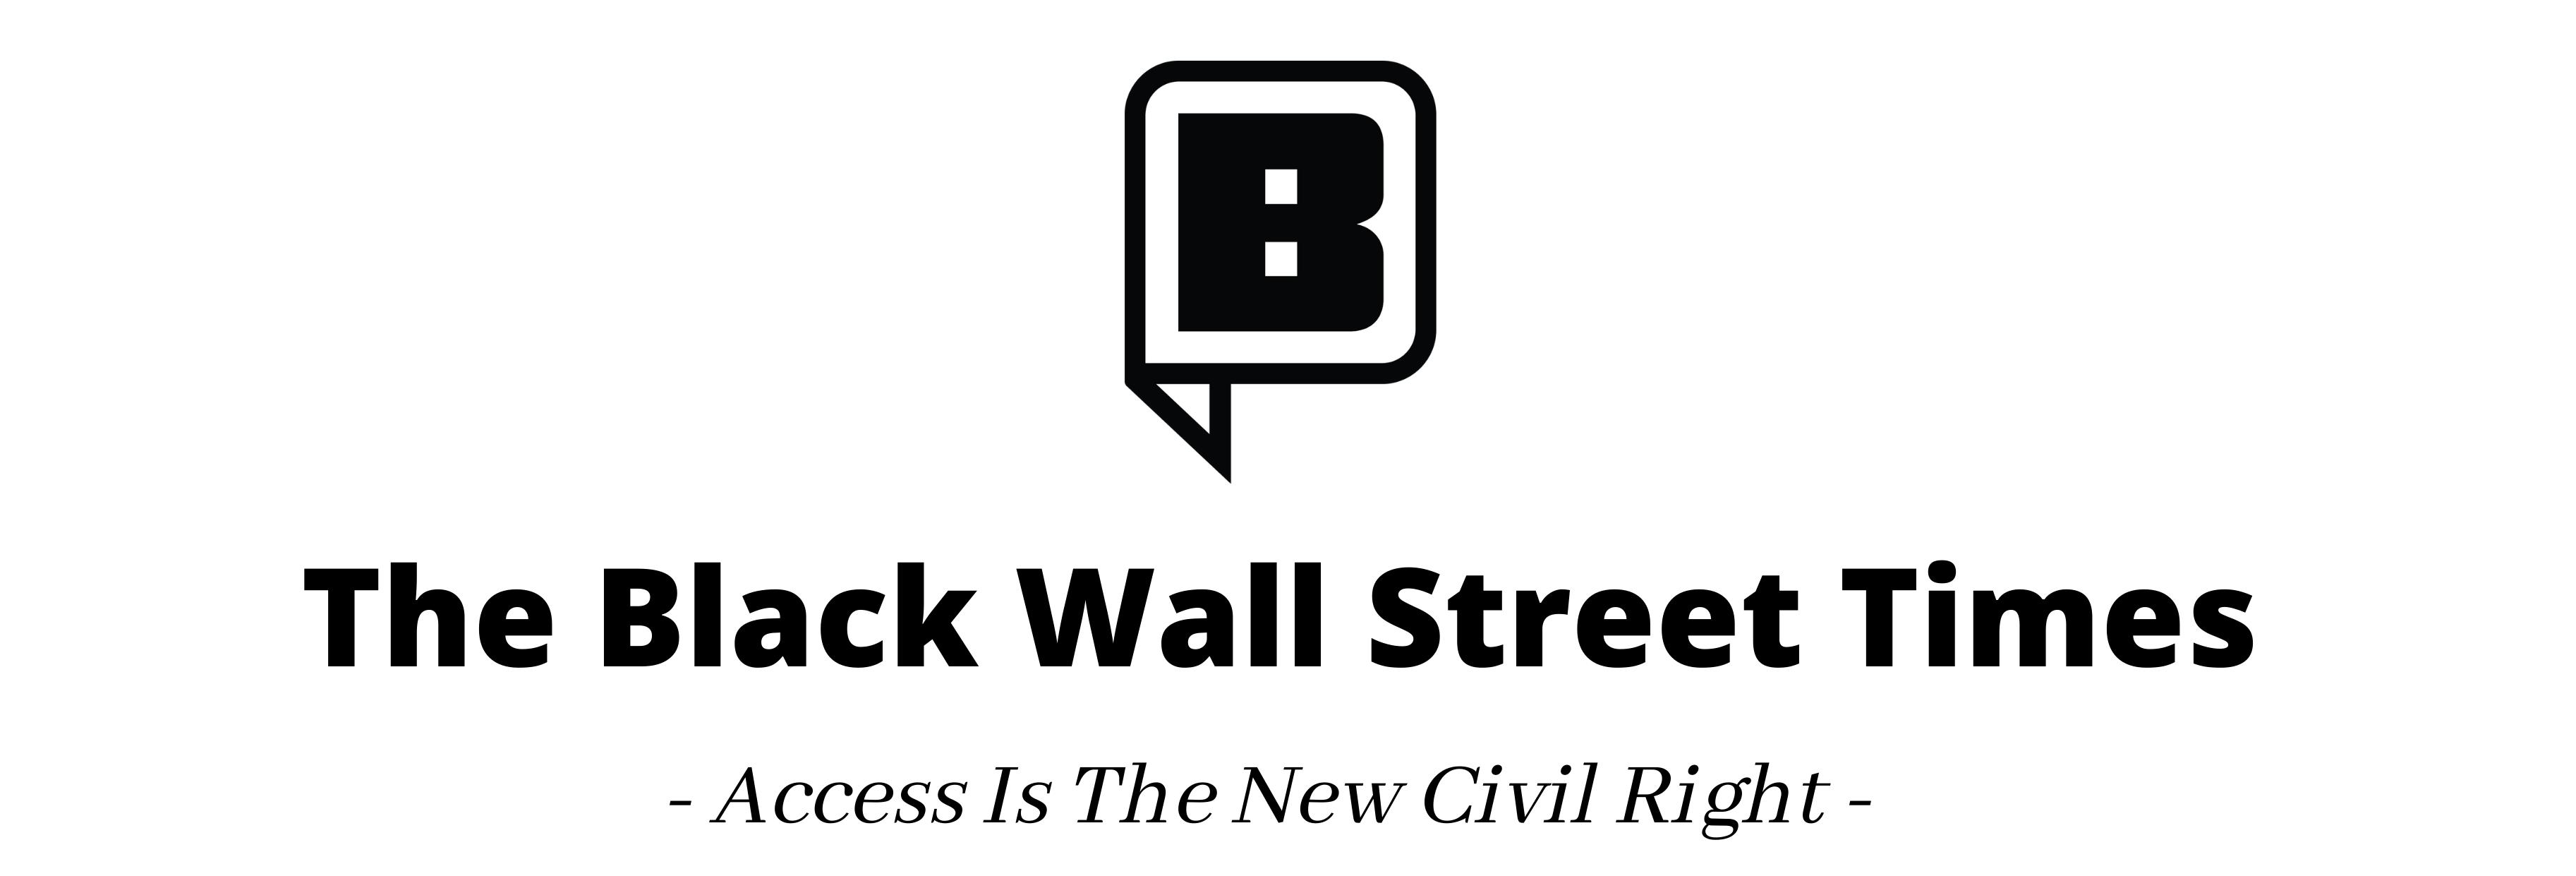 The Black Wall Street Times